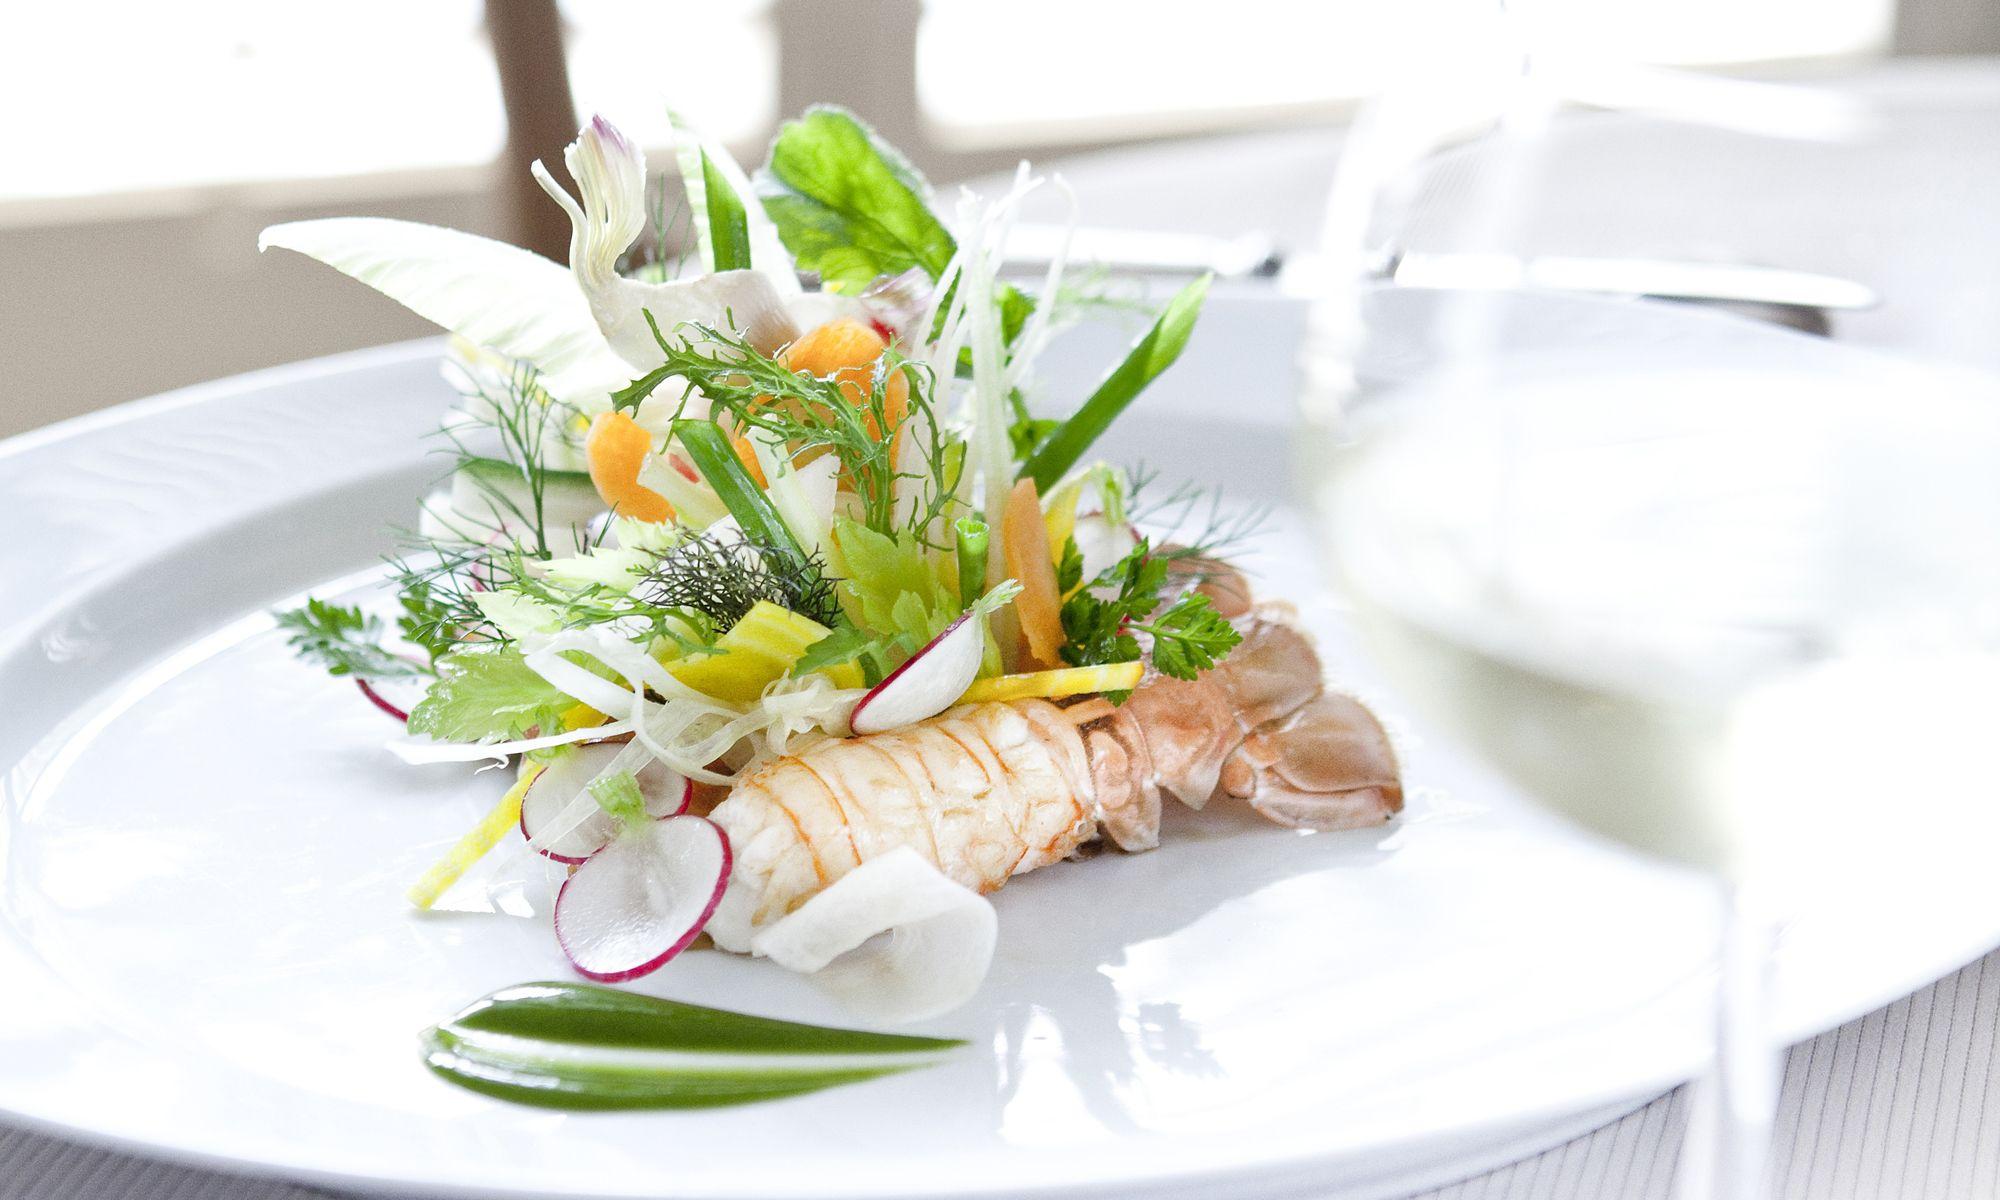 Alain Ducasse to Debut Rech Restaurant in February 2017